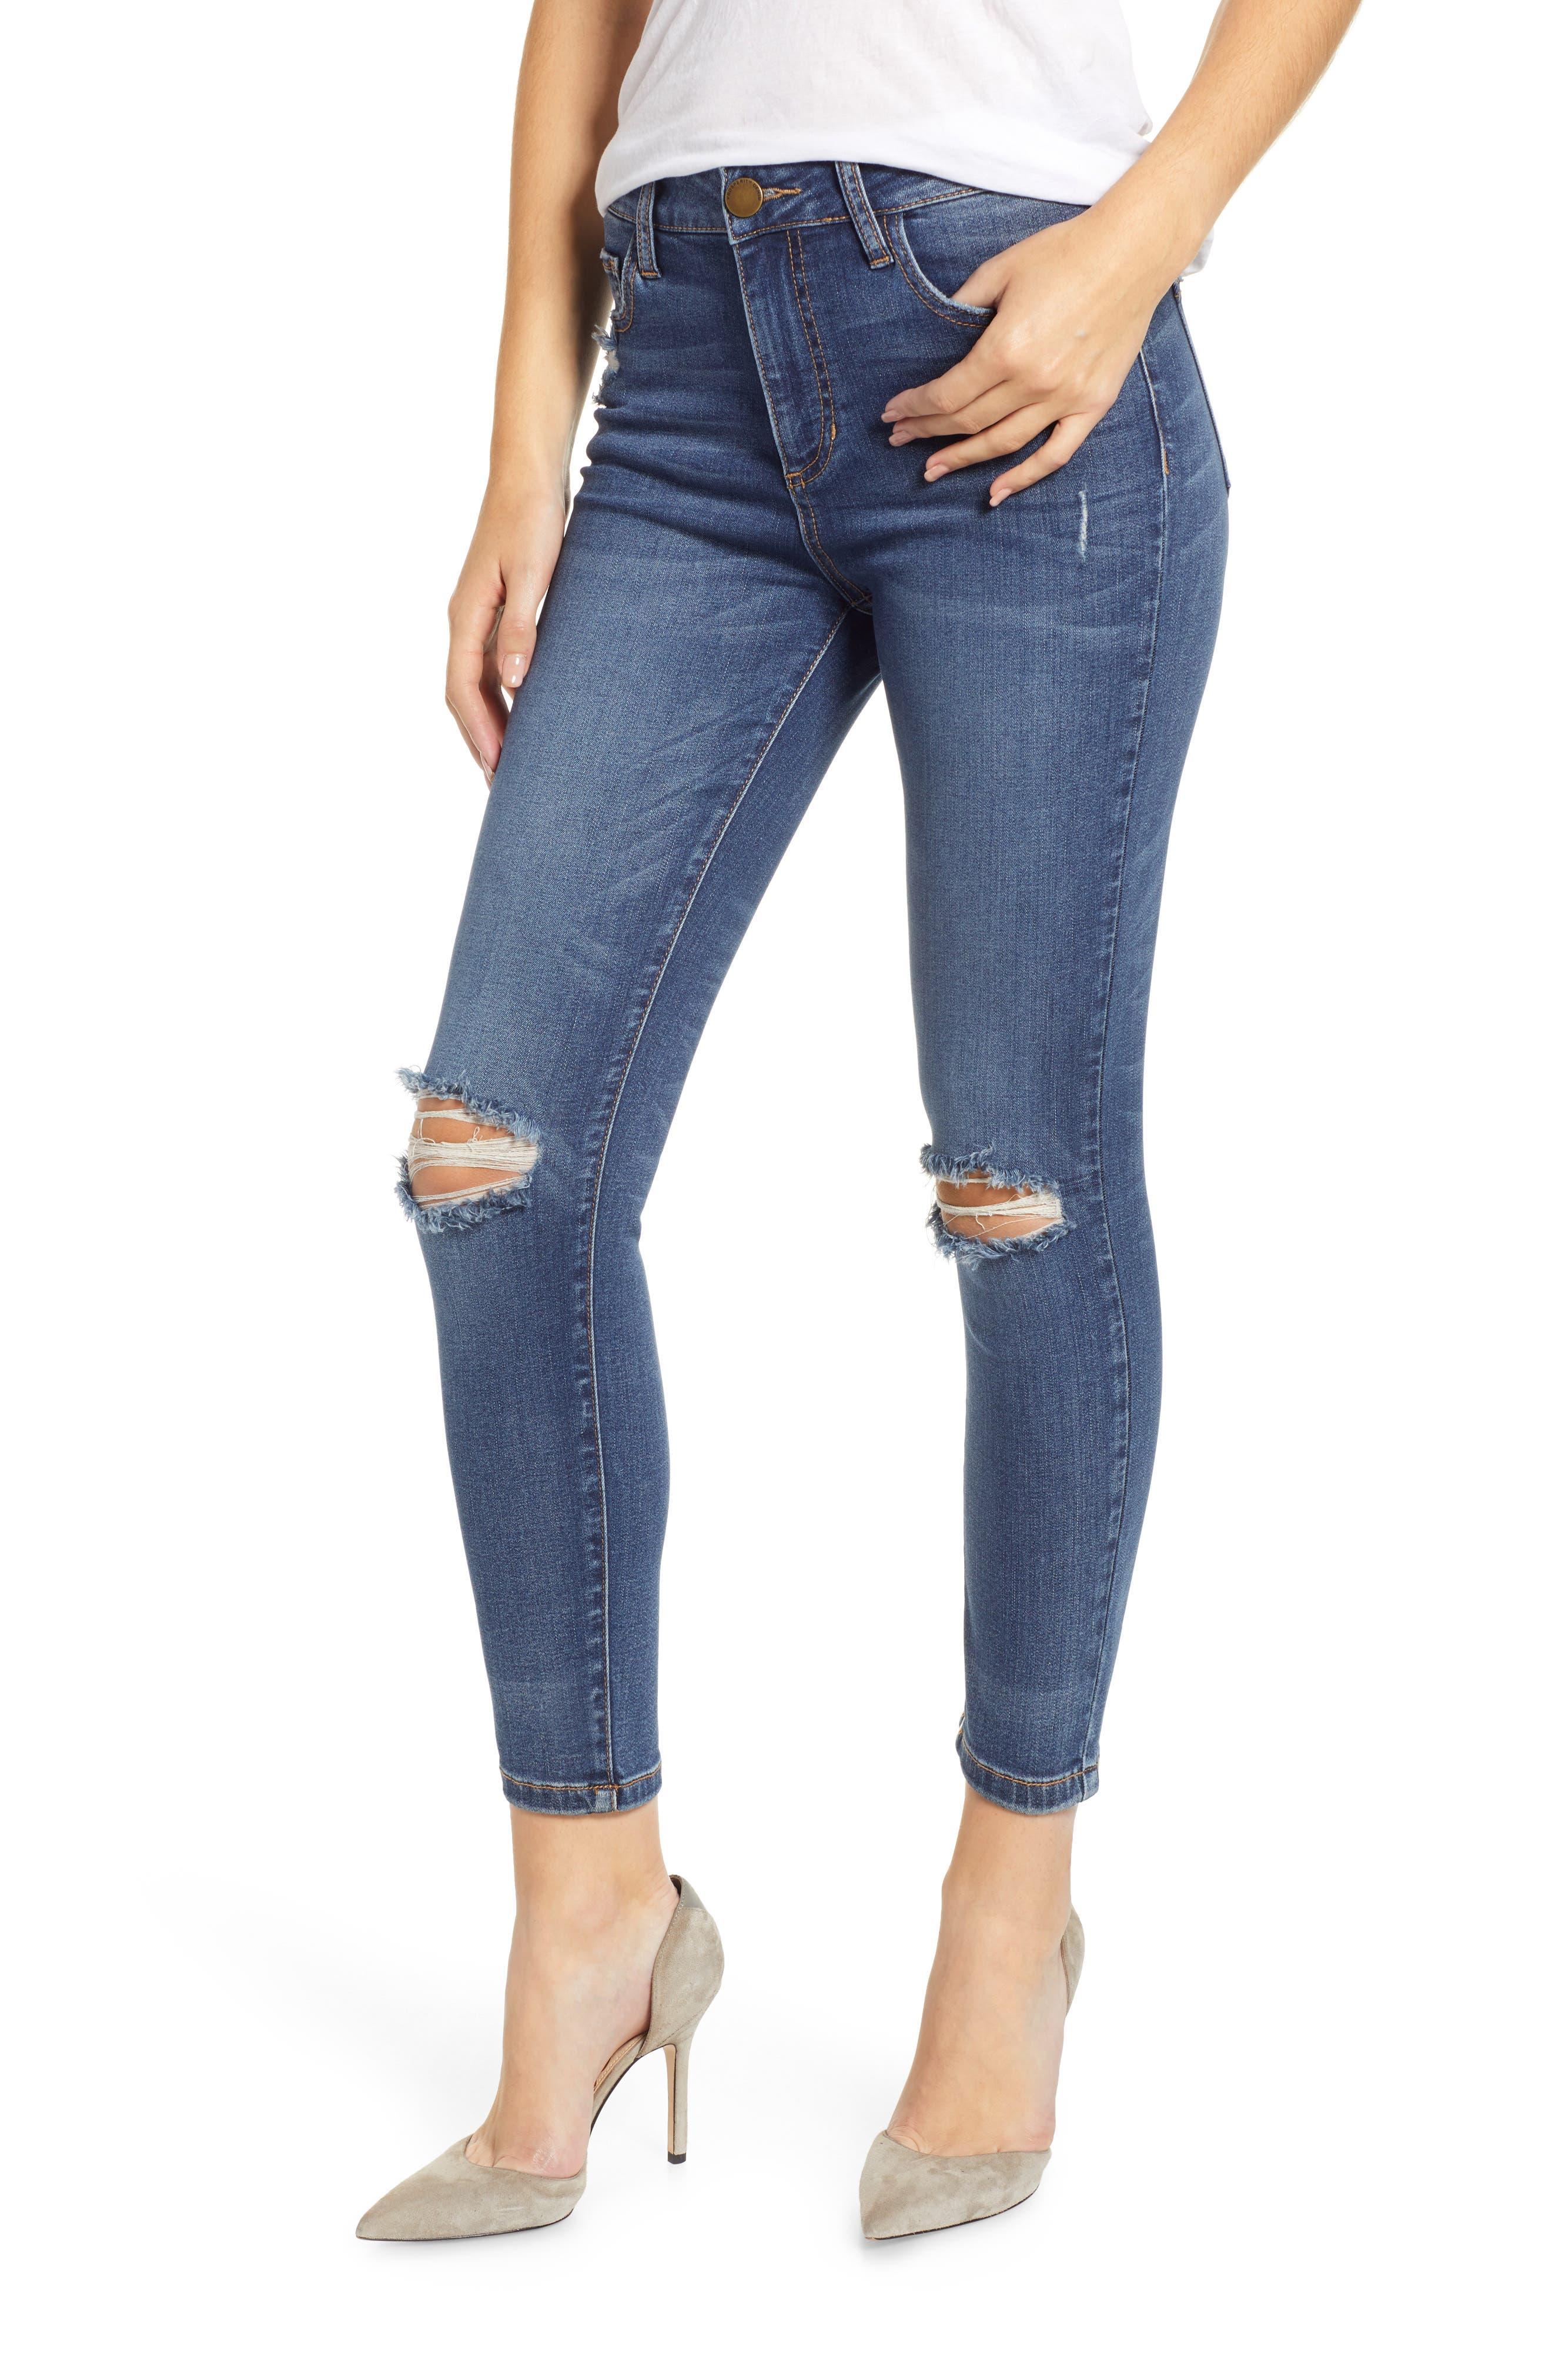 PROSPERITY DENIM,                             Ripped High Waist Skinny Jeans,                             Main thumbnail 1, color,                             RAYA WASH